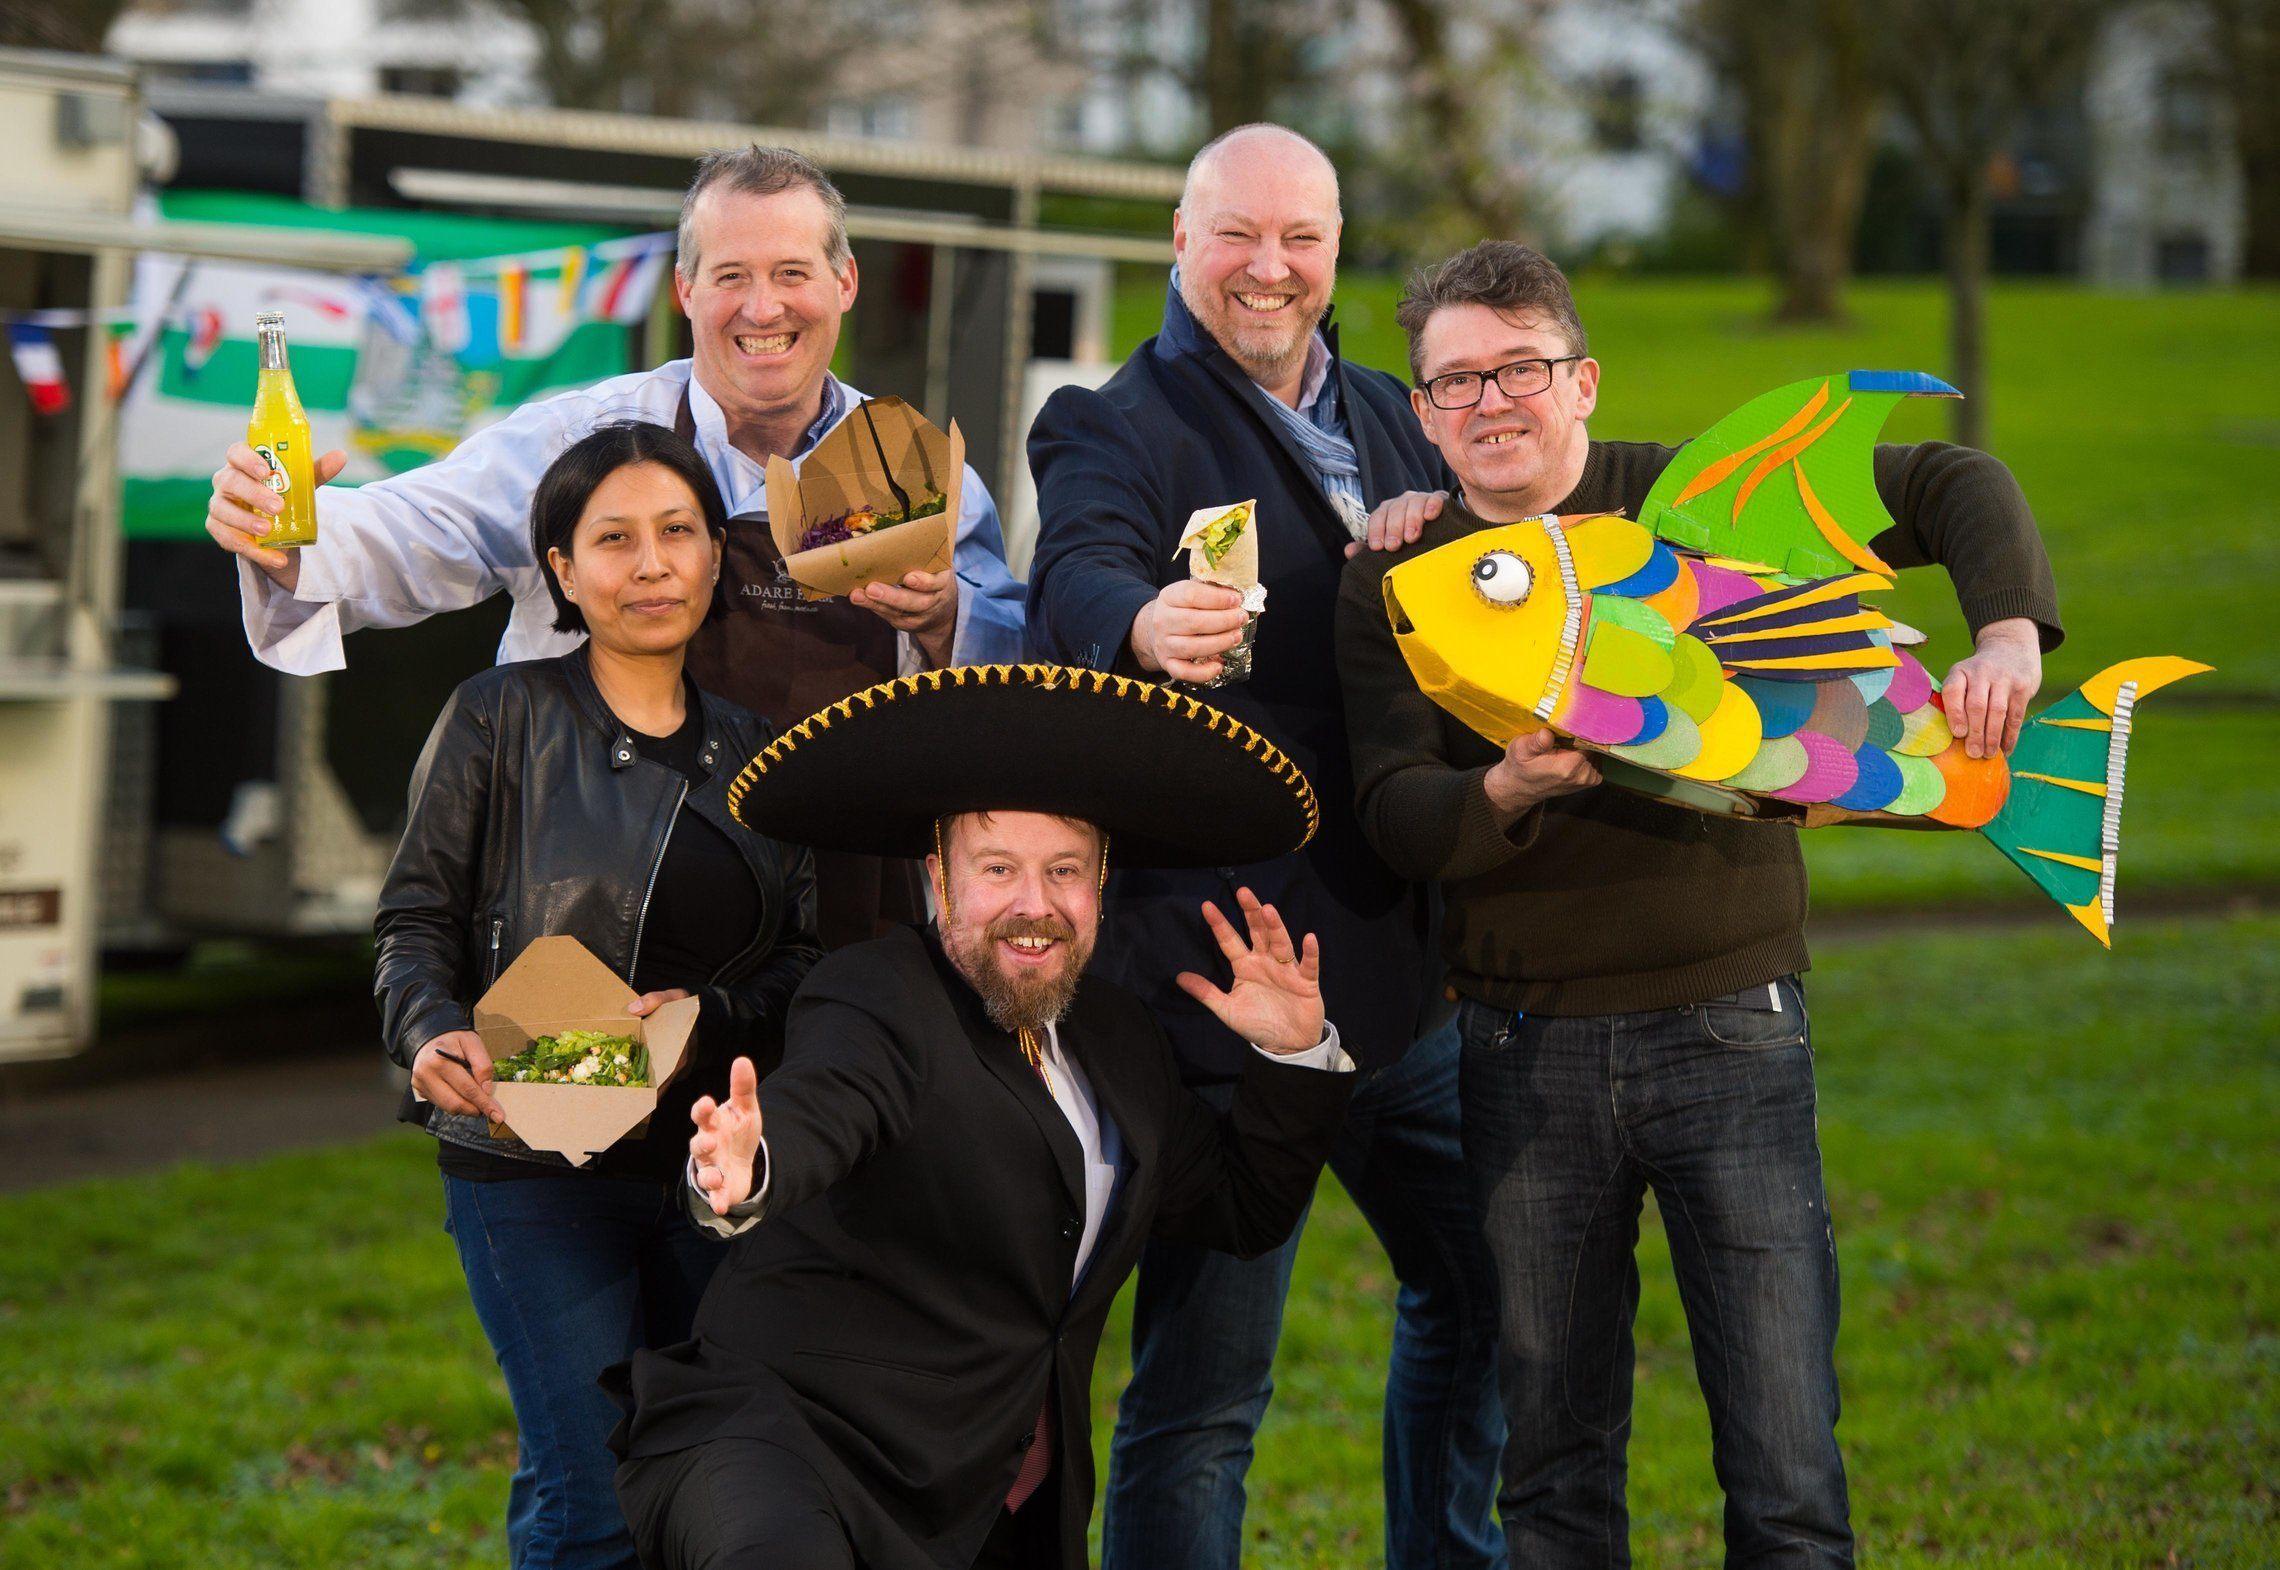 Limerick International Food Truck Festival